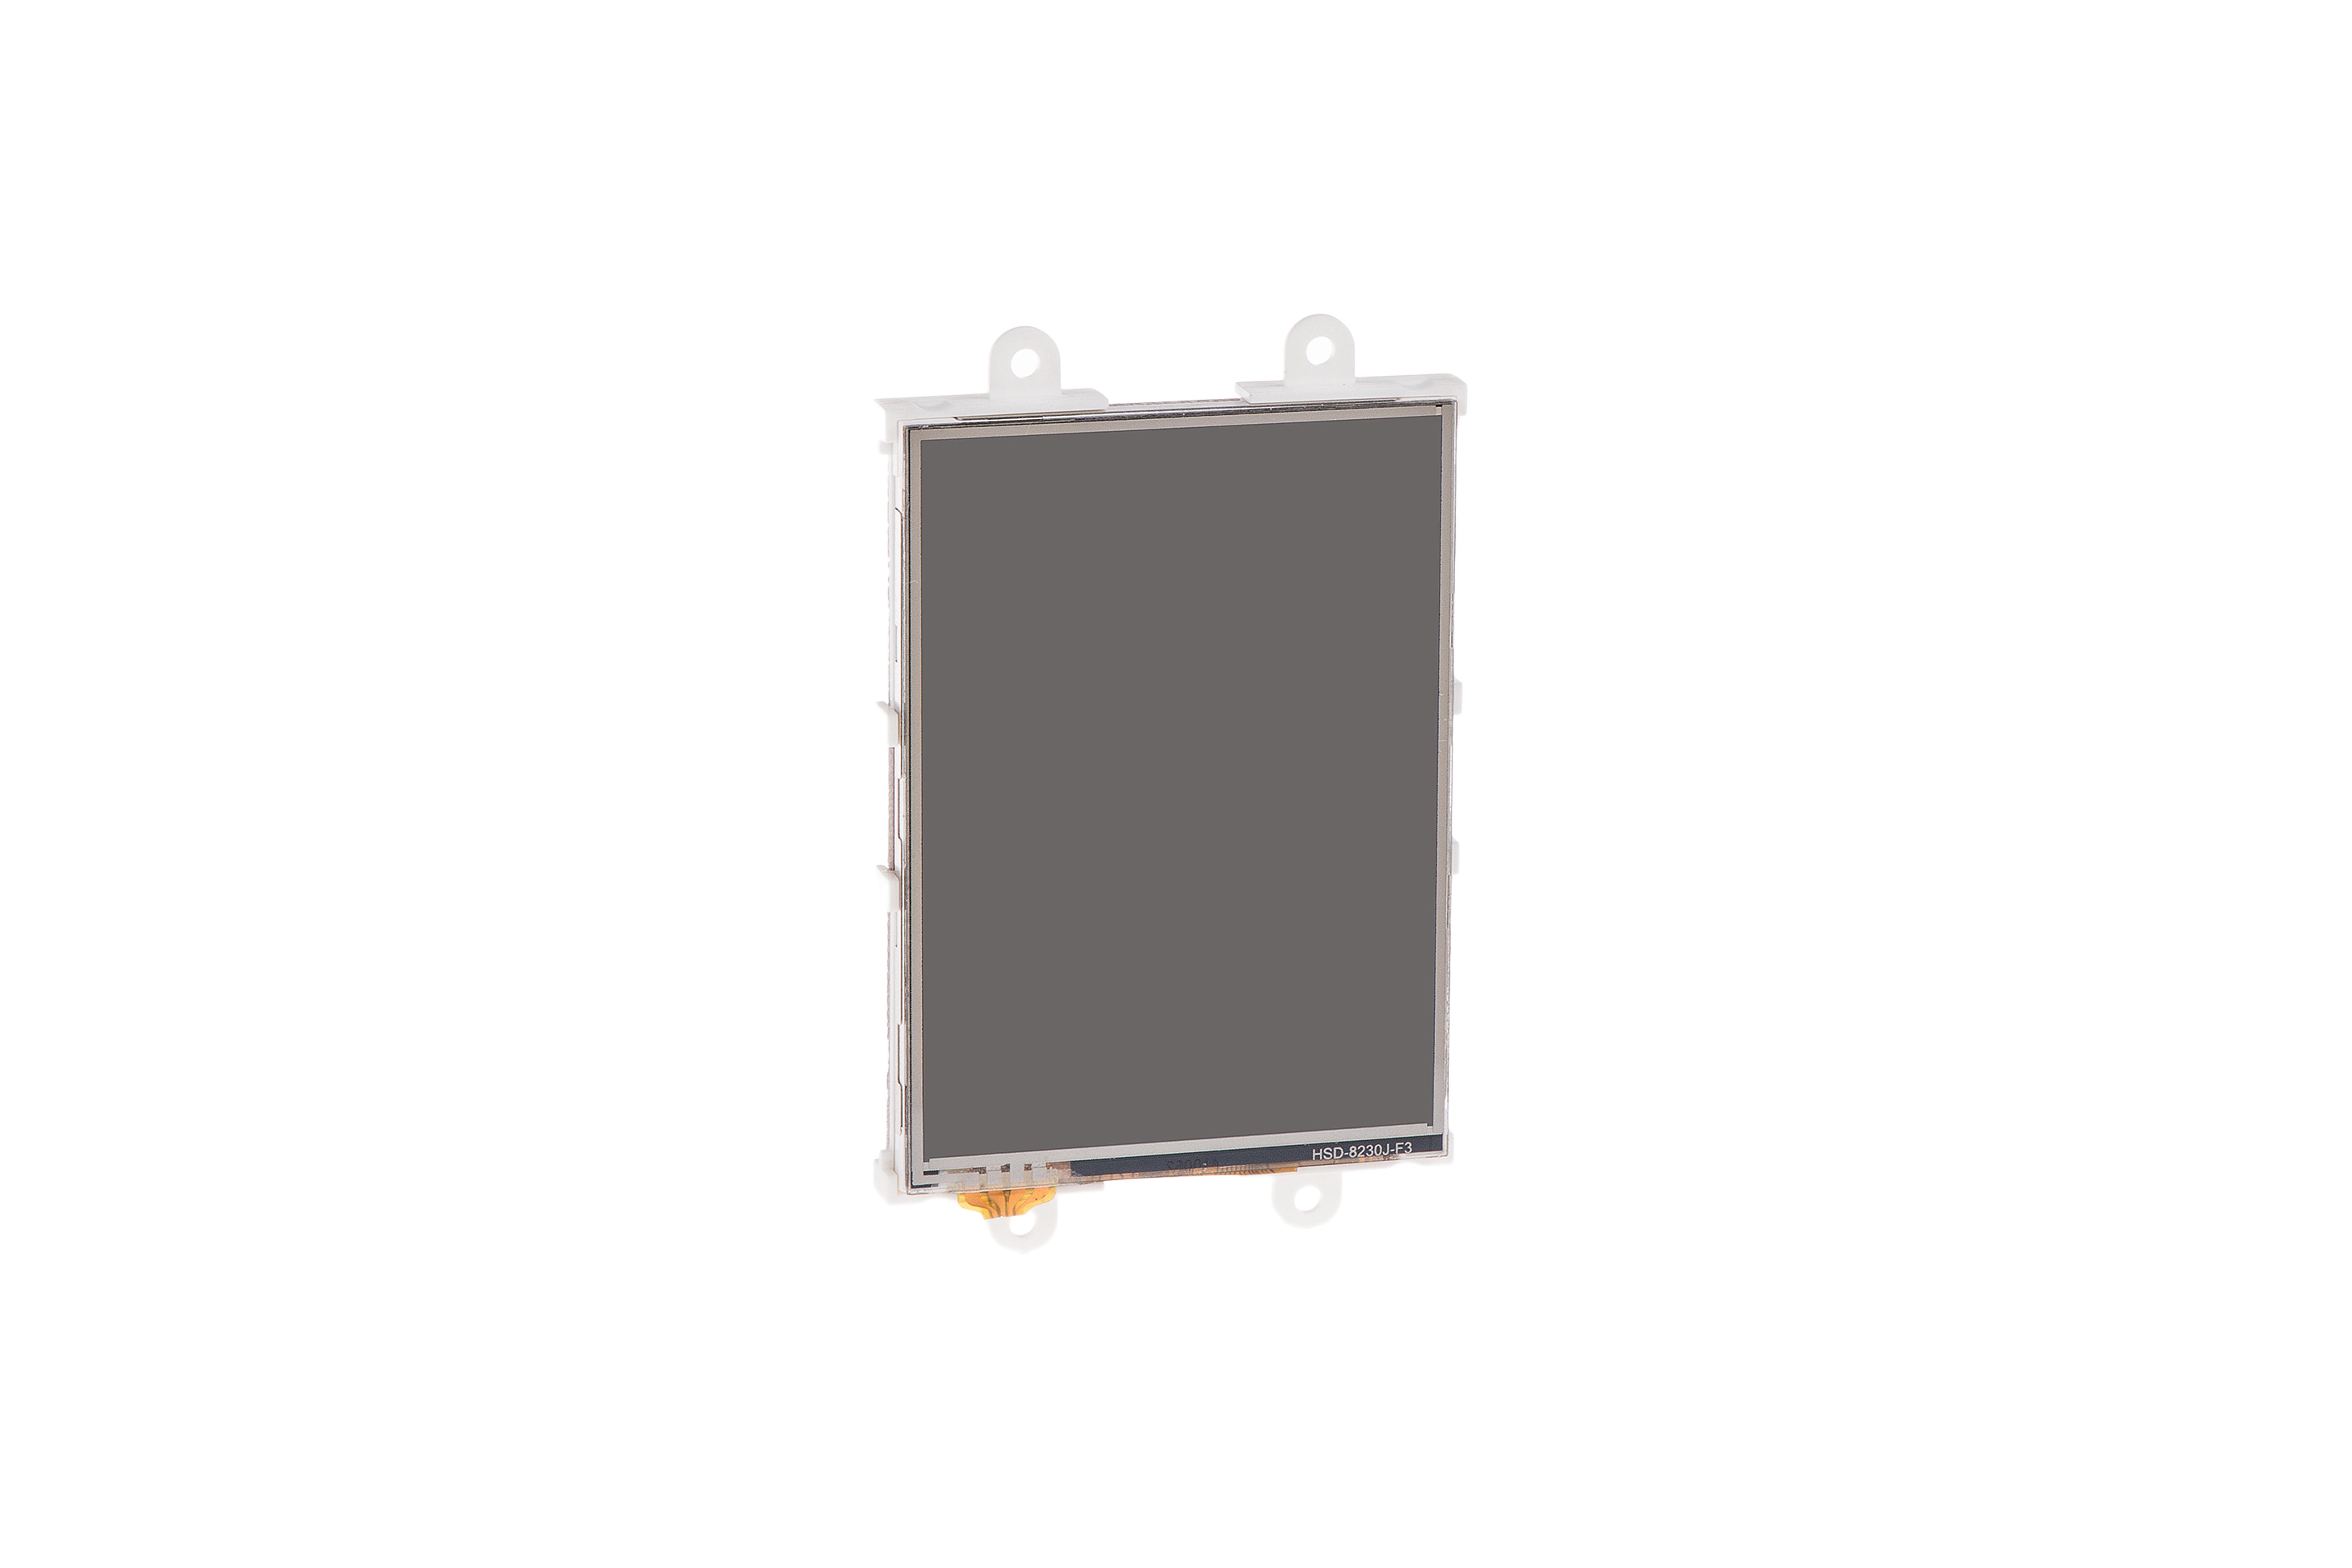 2,8 ZOLL LCD-STARTER-KIT FÜR RASPBERRY PI